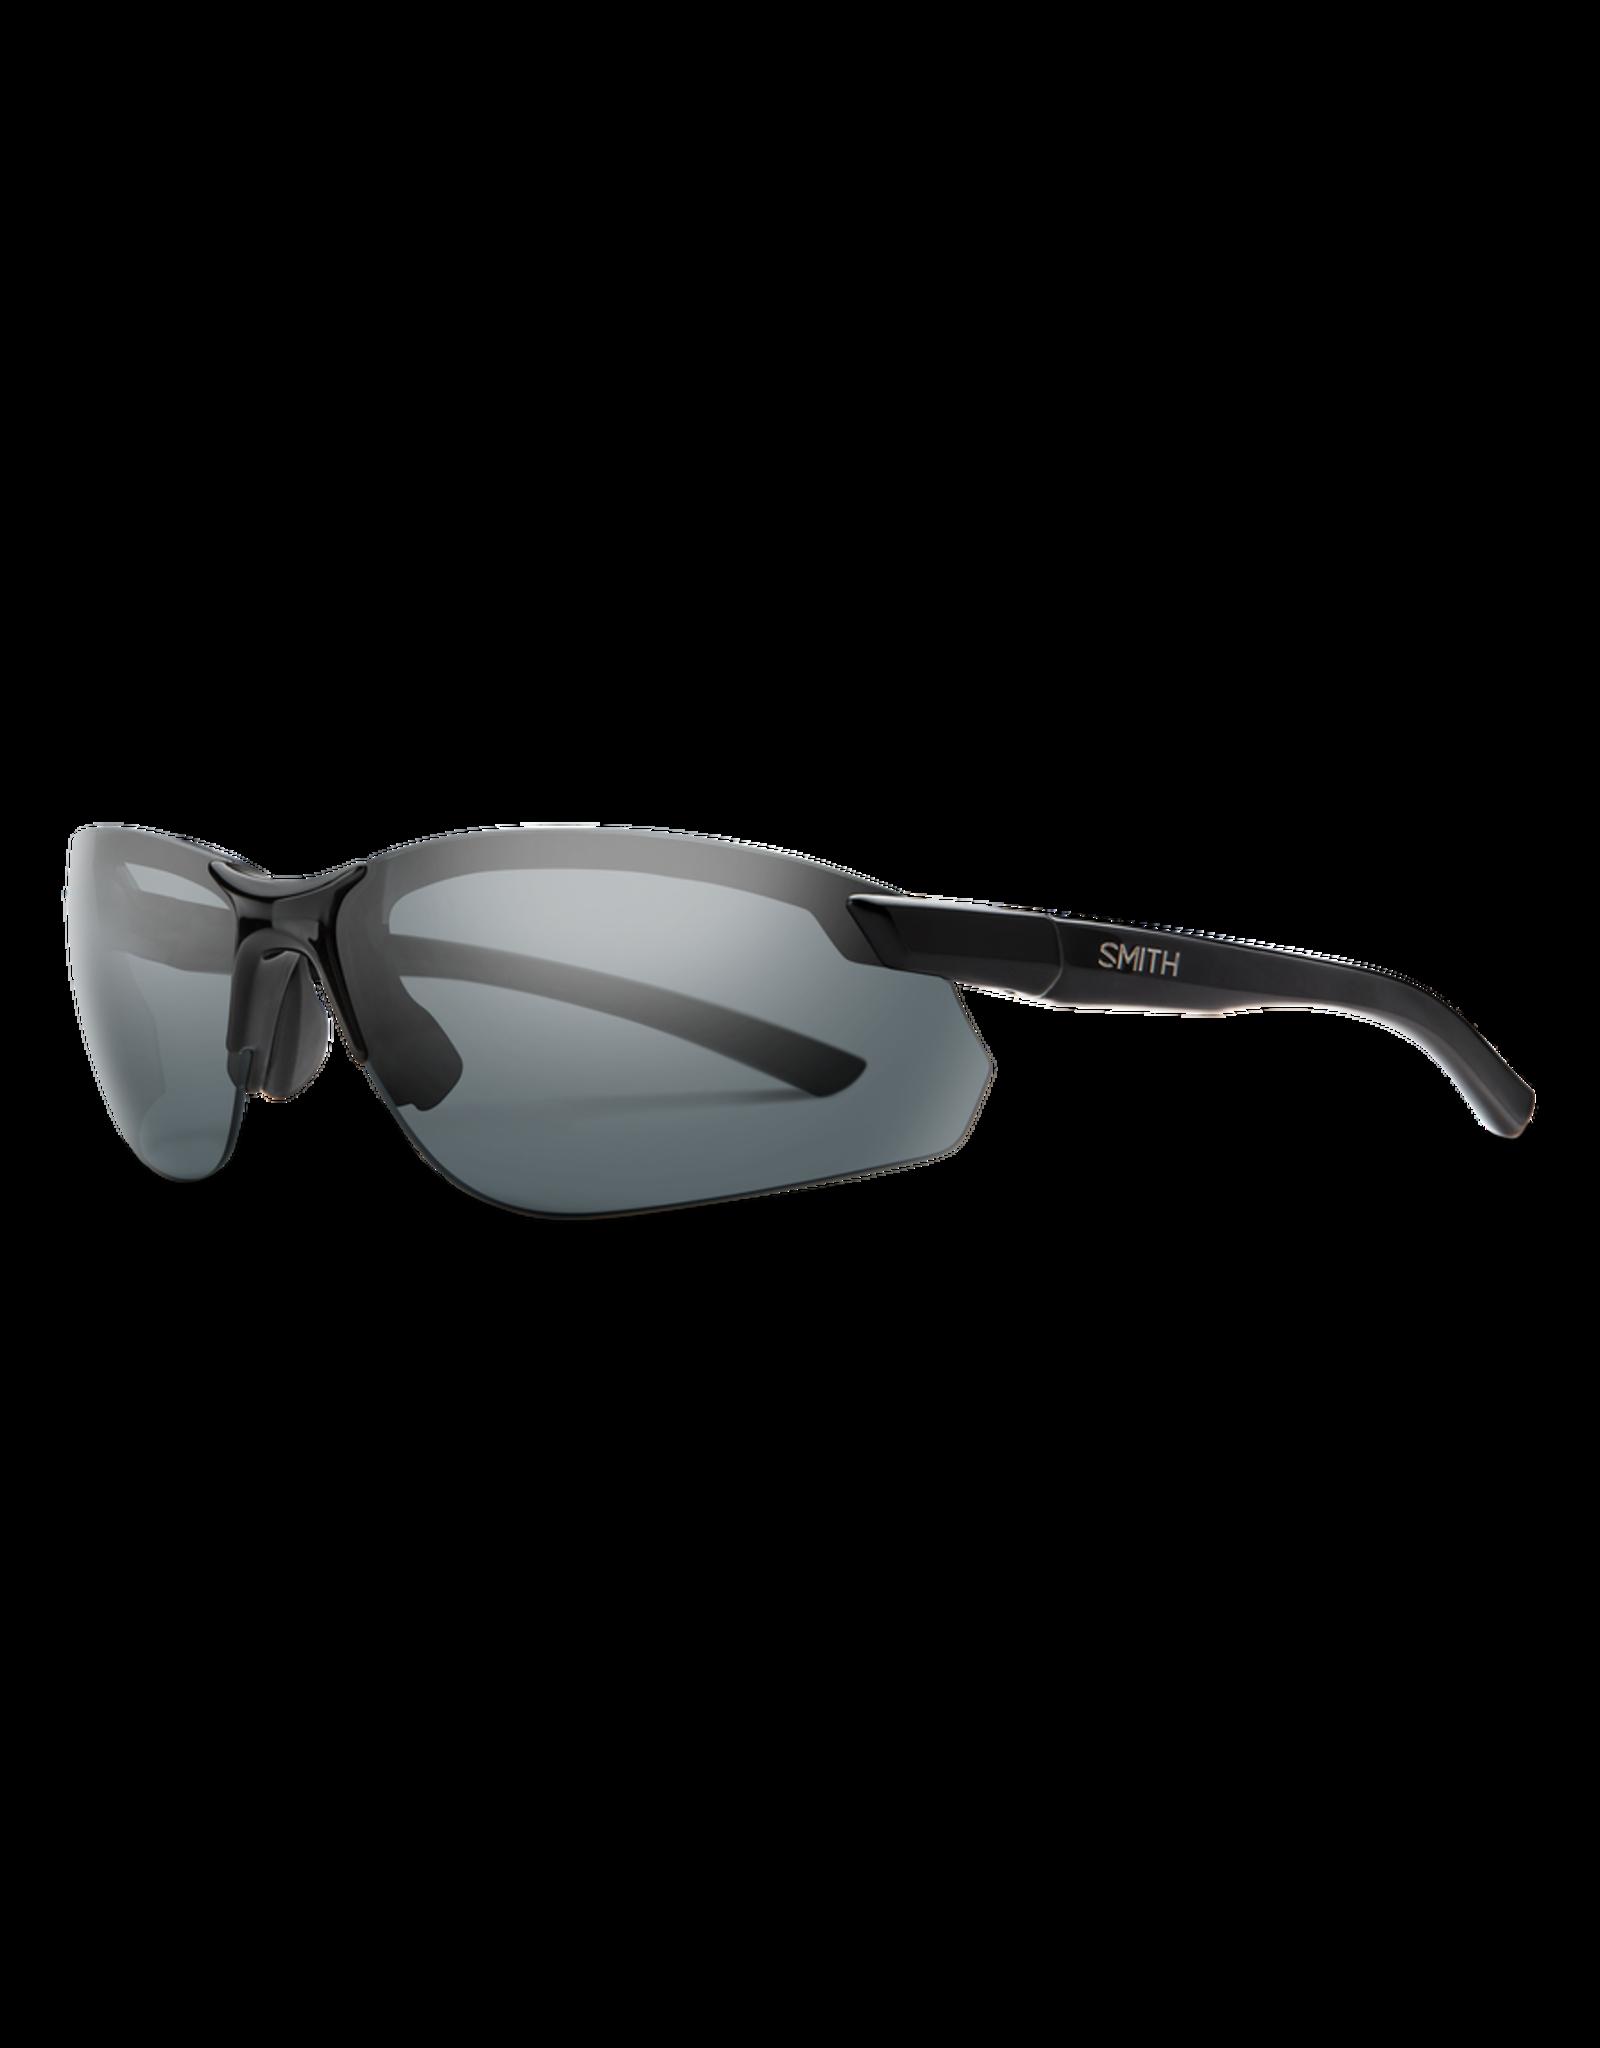 Smith SMITH, Sunglasses Parallel Max 2 , Black Frame, Polar. Grey Lens